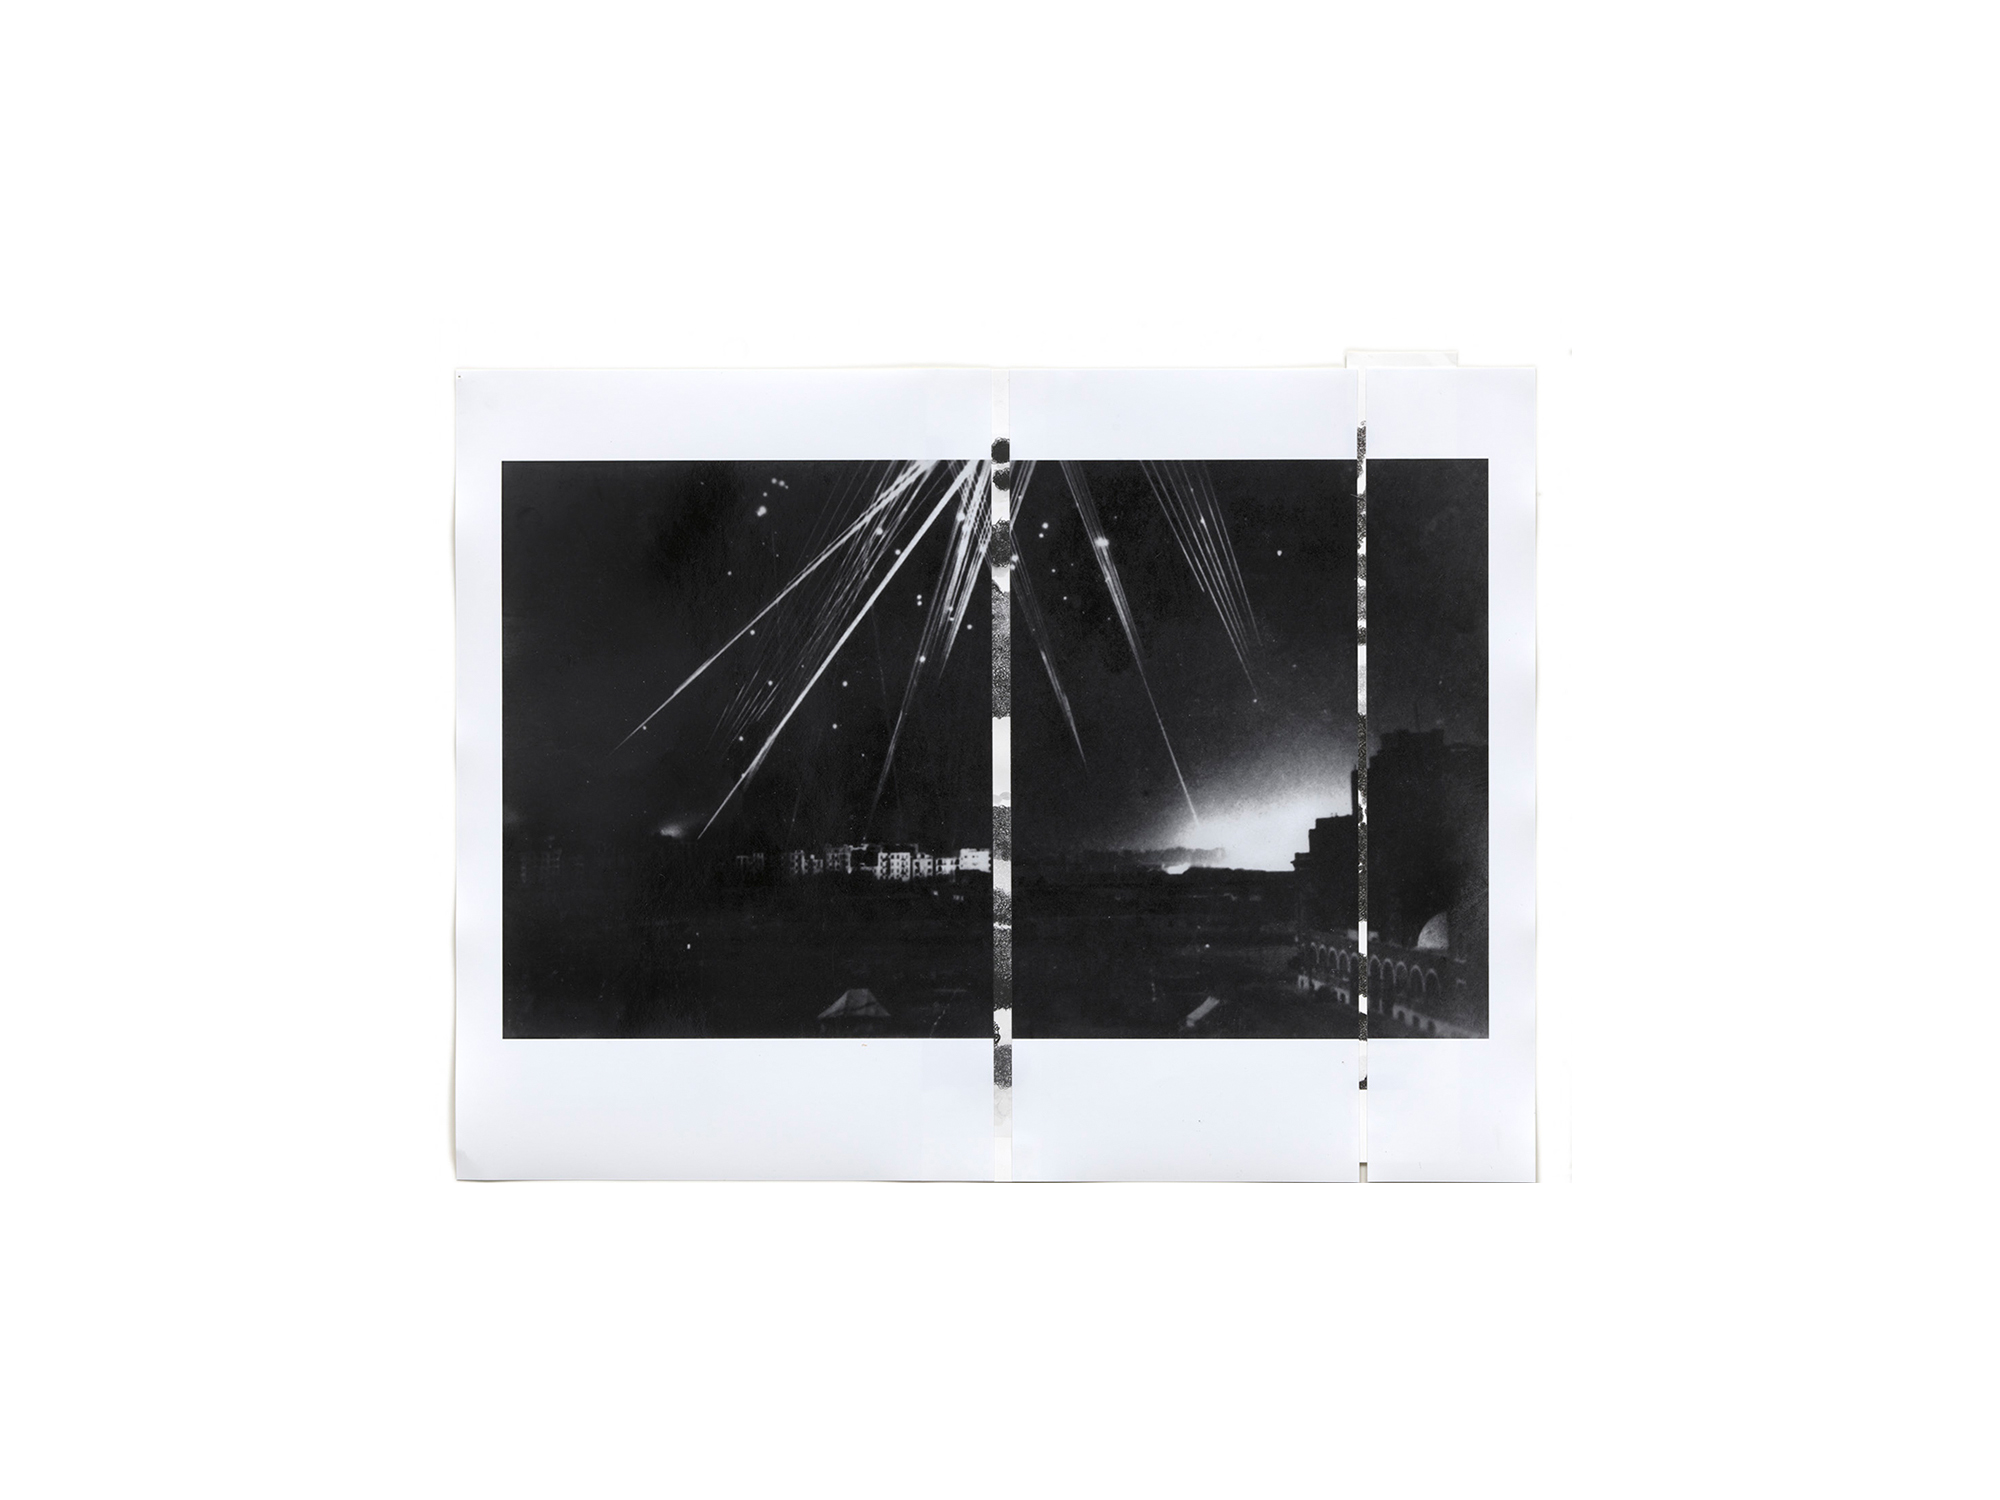 Denise Green   RJG: Air raid Alexandria 1 (Variant) , 2016 one photograph and two drawings 43 x 56.5cm   ARTIST BIO